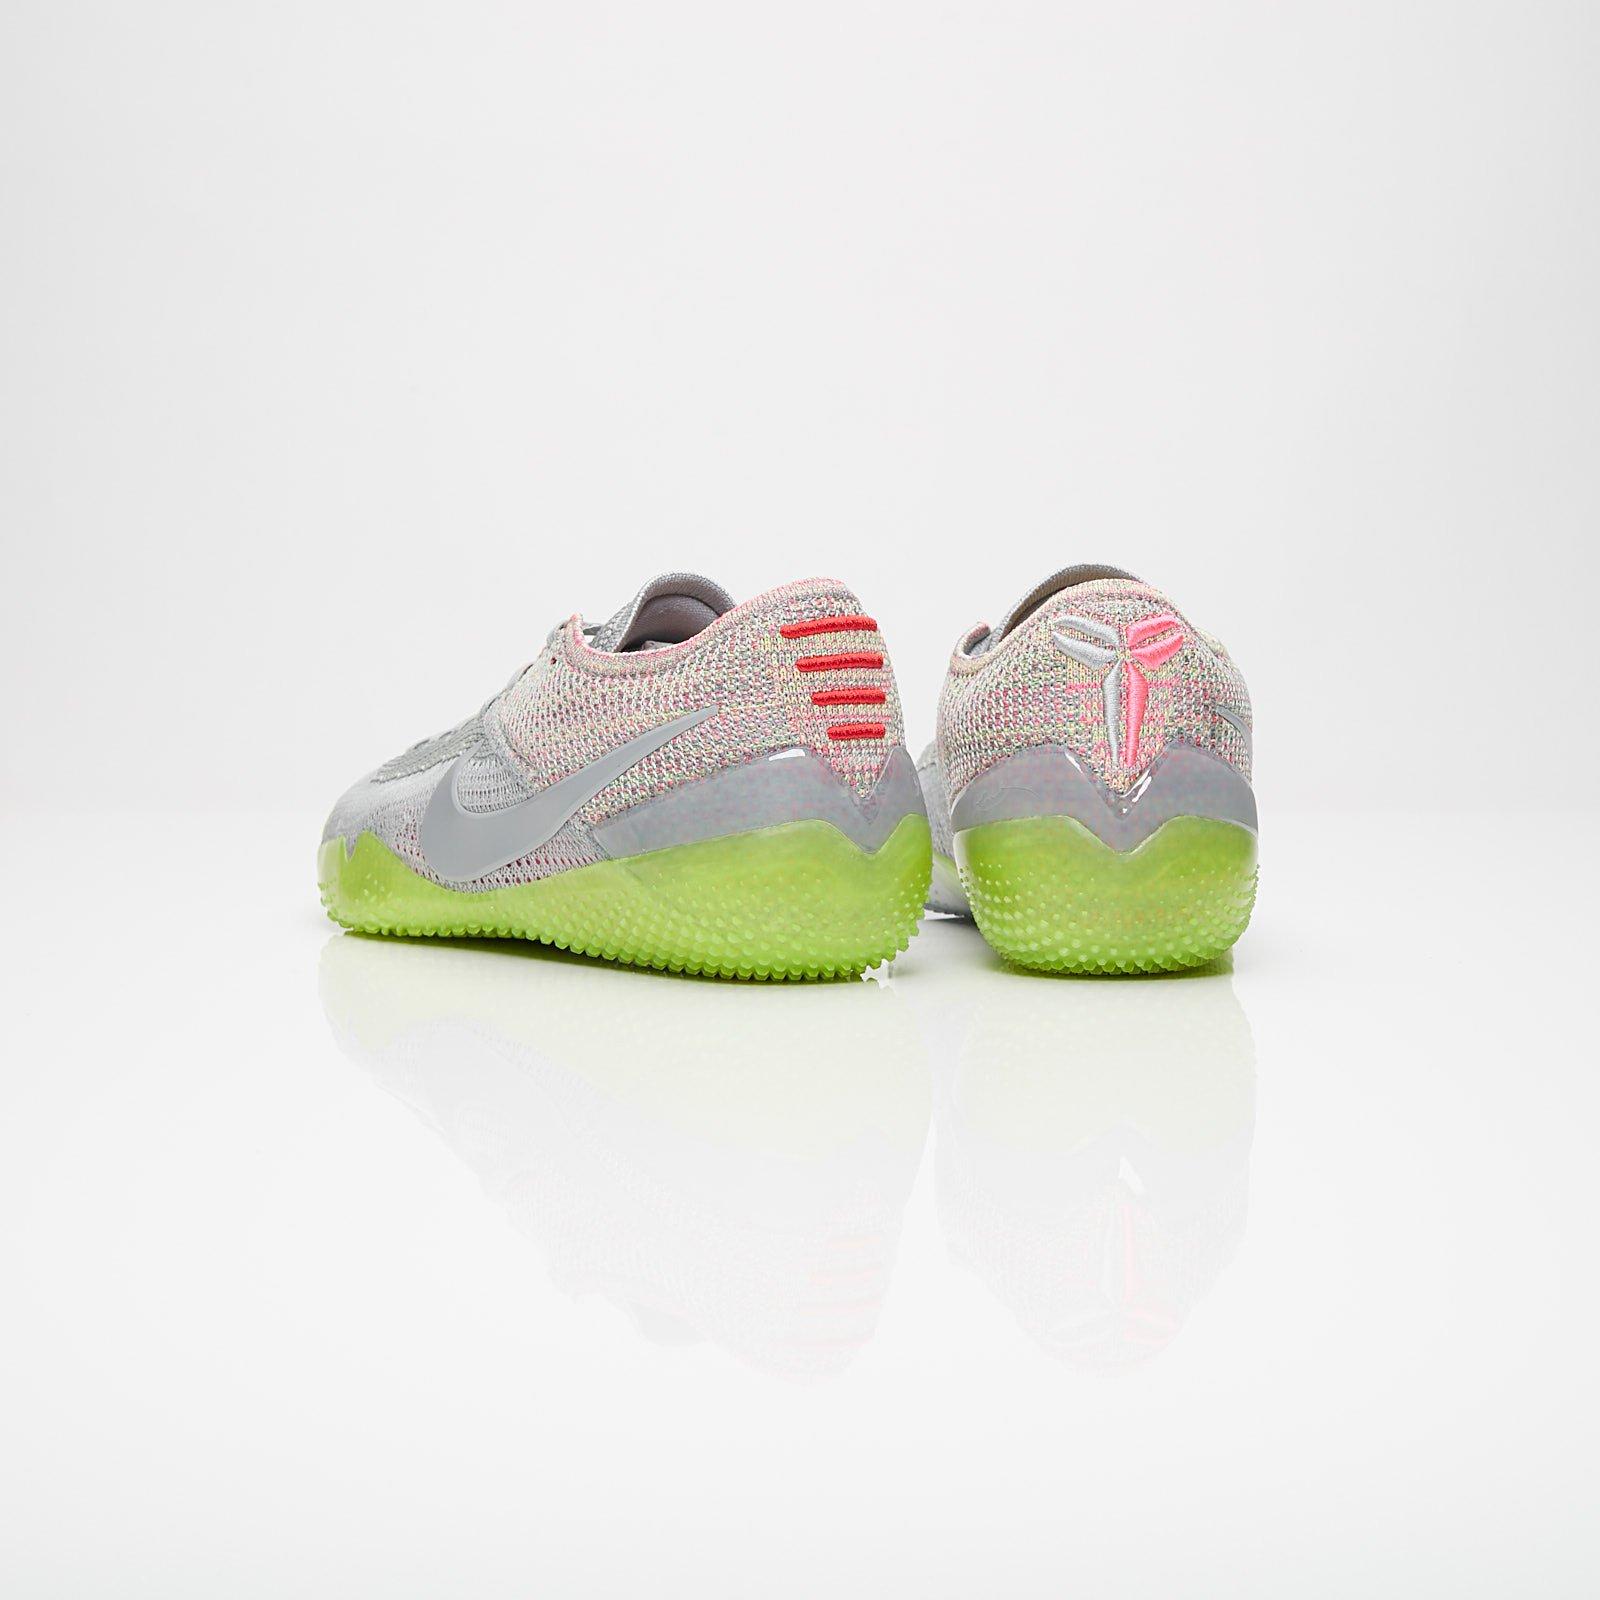 brand new 95b42 c0f44 Nike Kobe AD Nxt 360 - Aq1087-003 - Sneakersnstuff   sneakers   streetwear  online since 1999